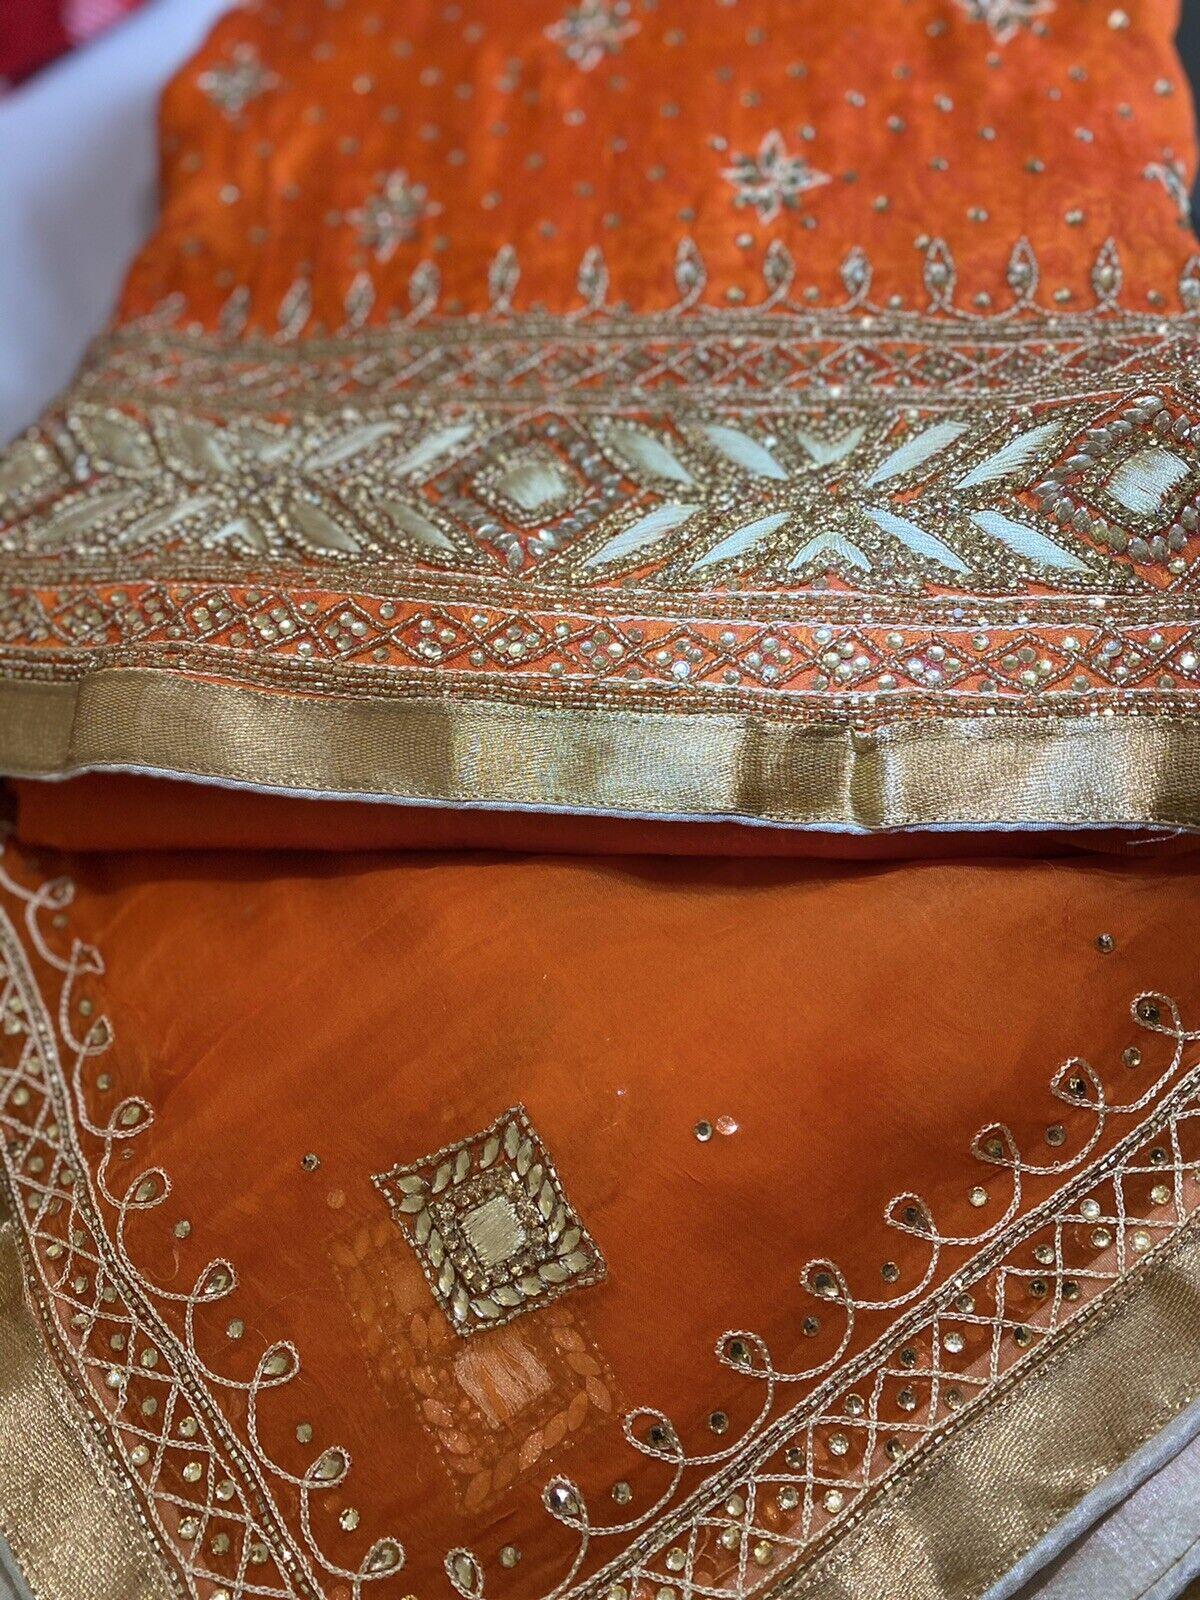 Unstitched Asian Ladies Salwar Kameez Heavy Duppata, 5 Metre All Over Suit